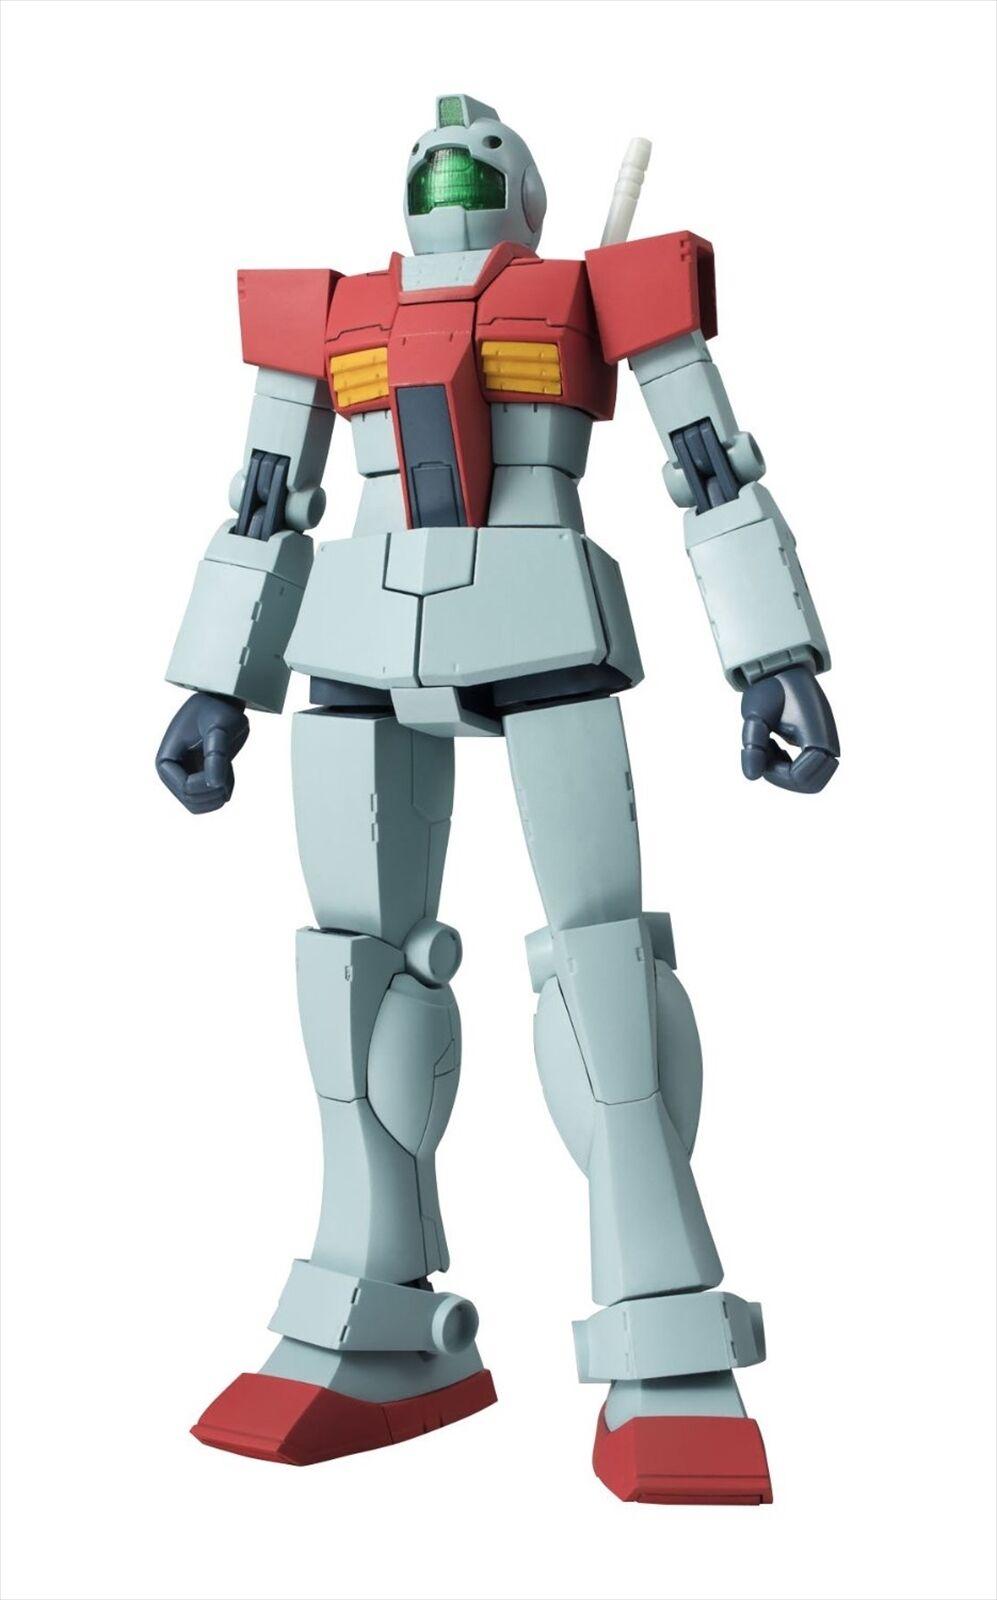 Bandai Robot Spirits SIDE MS RGM-79 GM ver. A.N.I.M.E Mobile Suit Gundam Figure